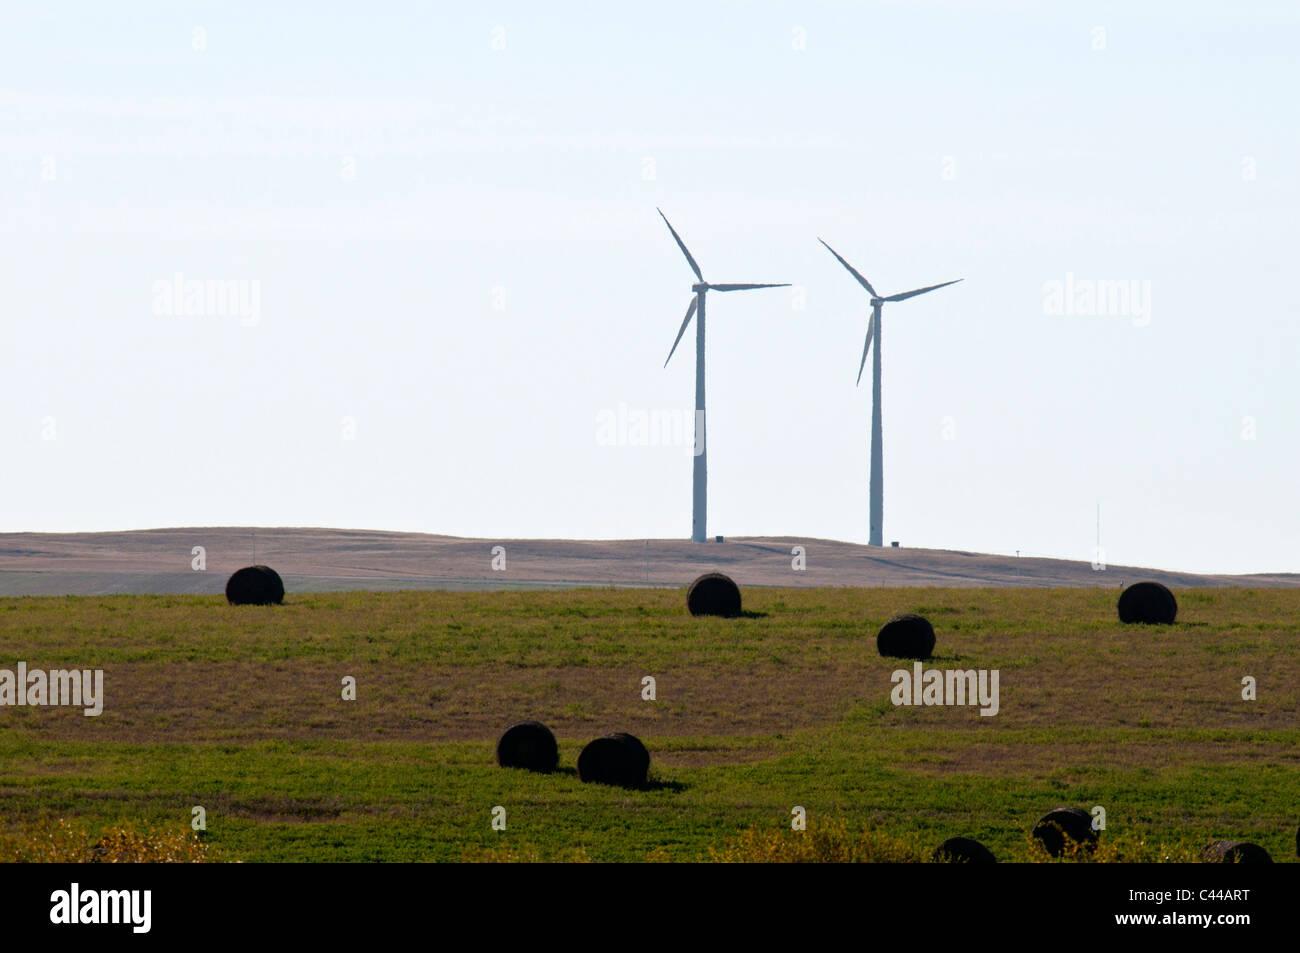 Sonne zu überbrücken, Wind Power Project, Gull Lake, Saskatchewan, Kanada, Wind, Kraft, Energie, Nordamerika, Stockbild